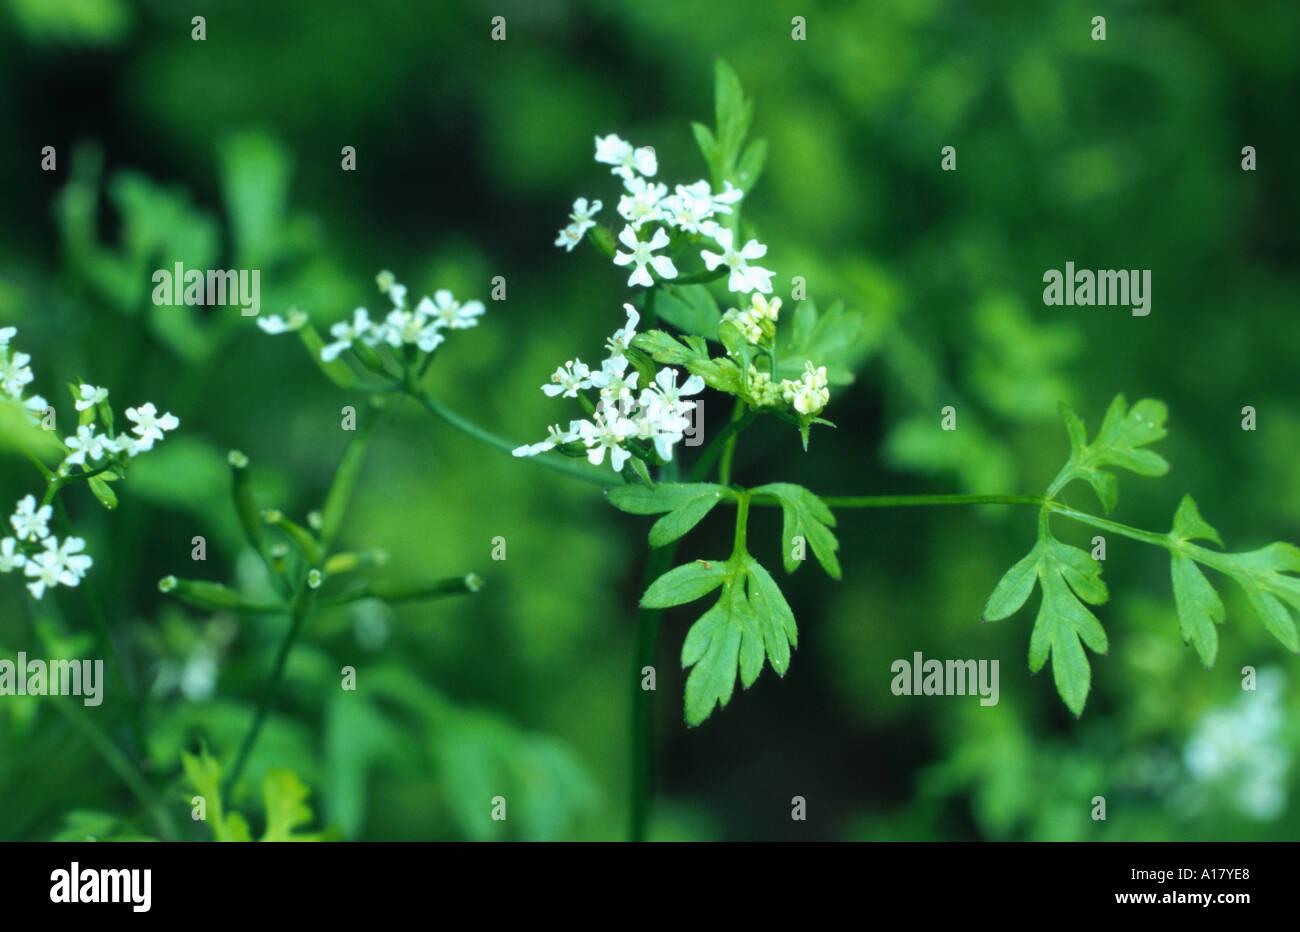 garden chervil common chervil Anthriscus cerefolium blooming